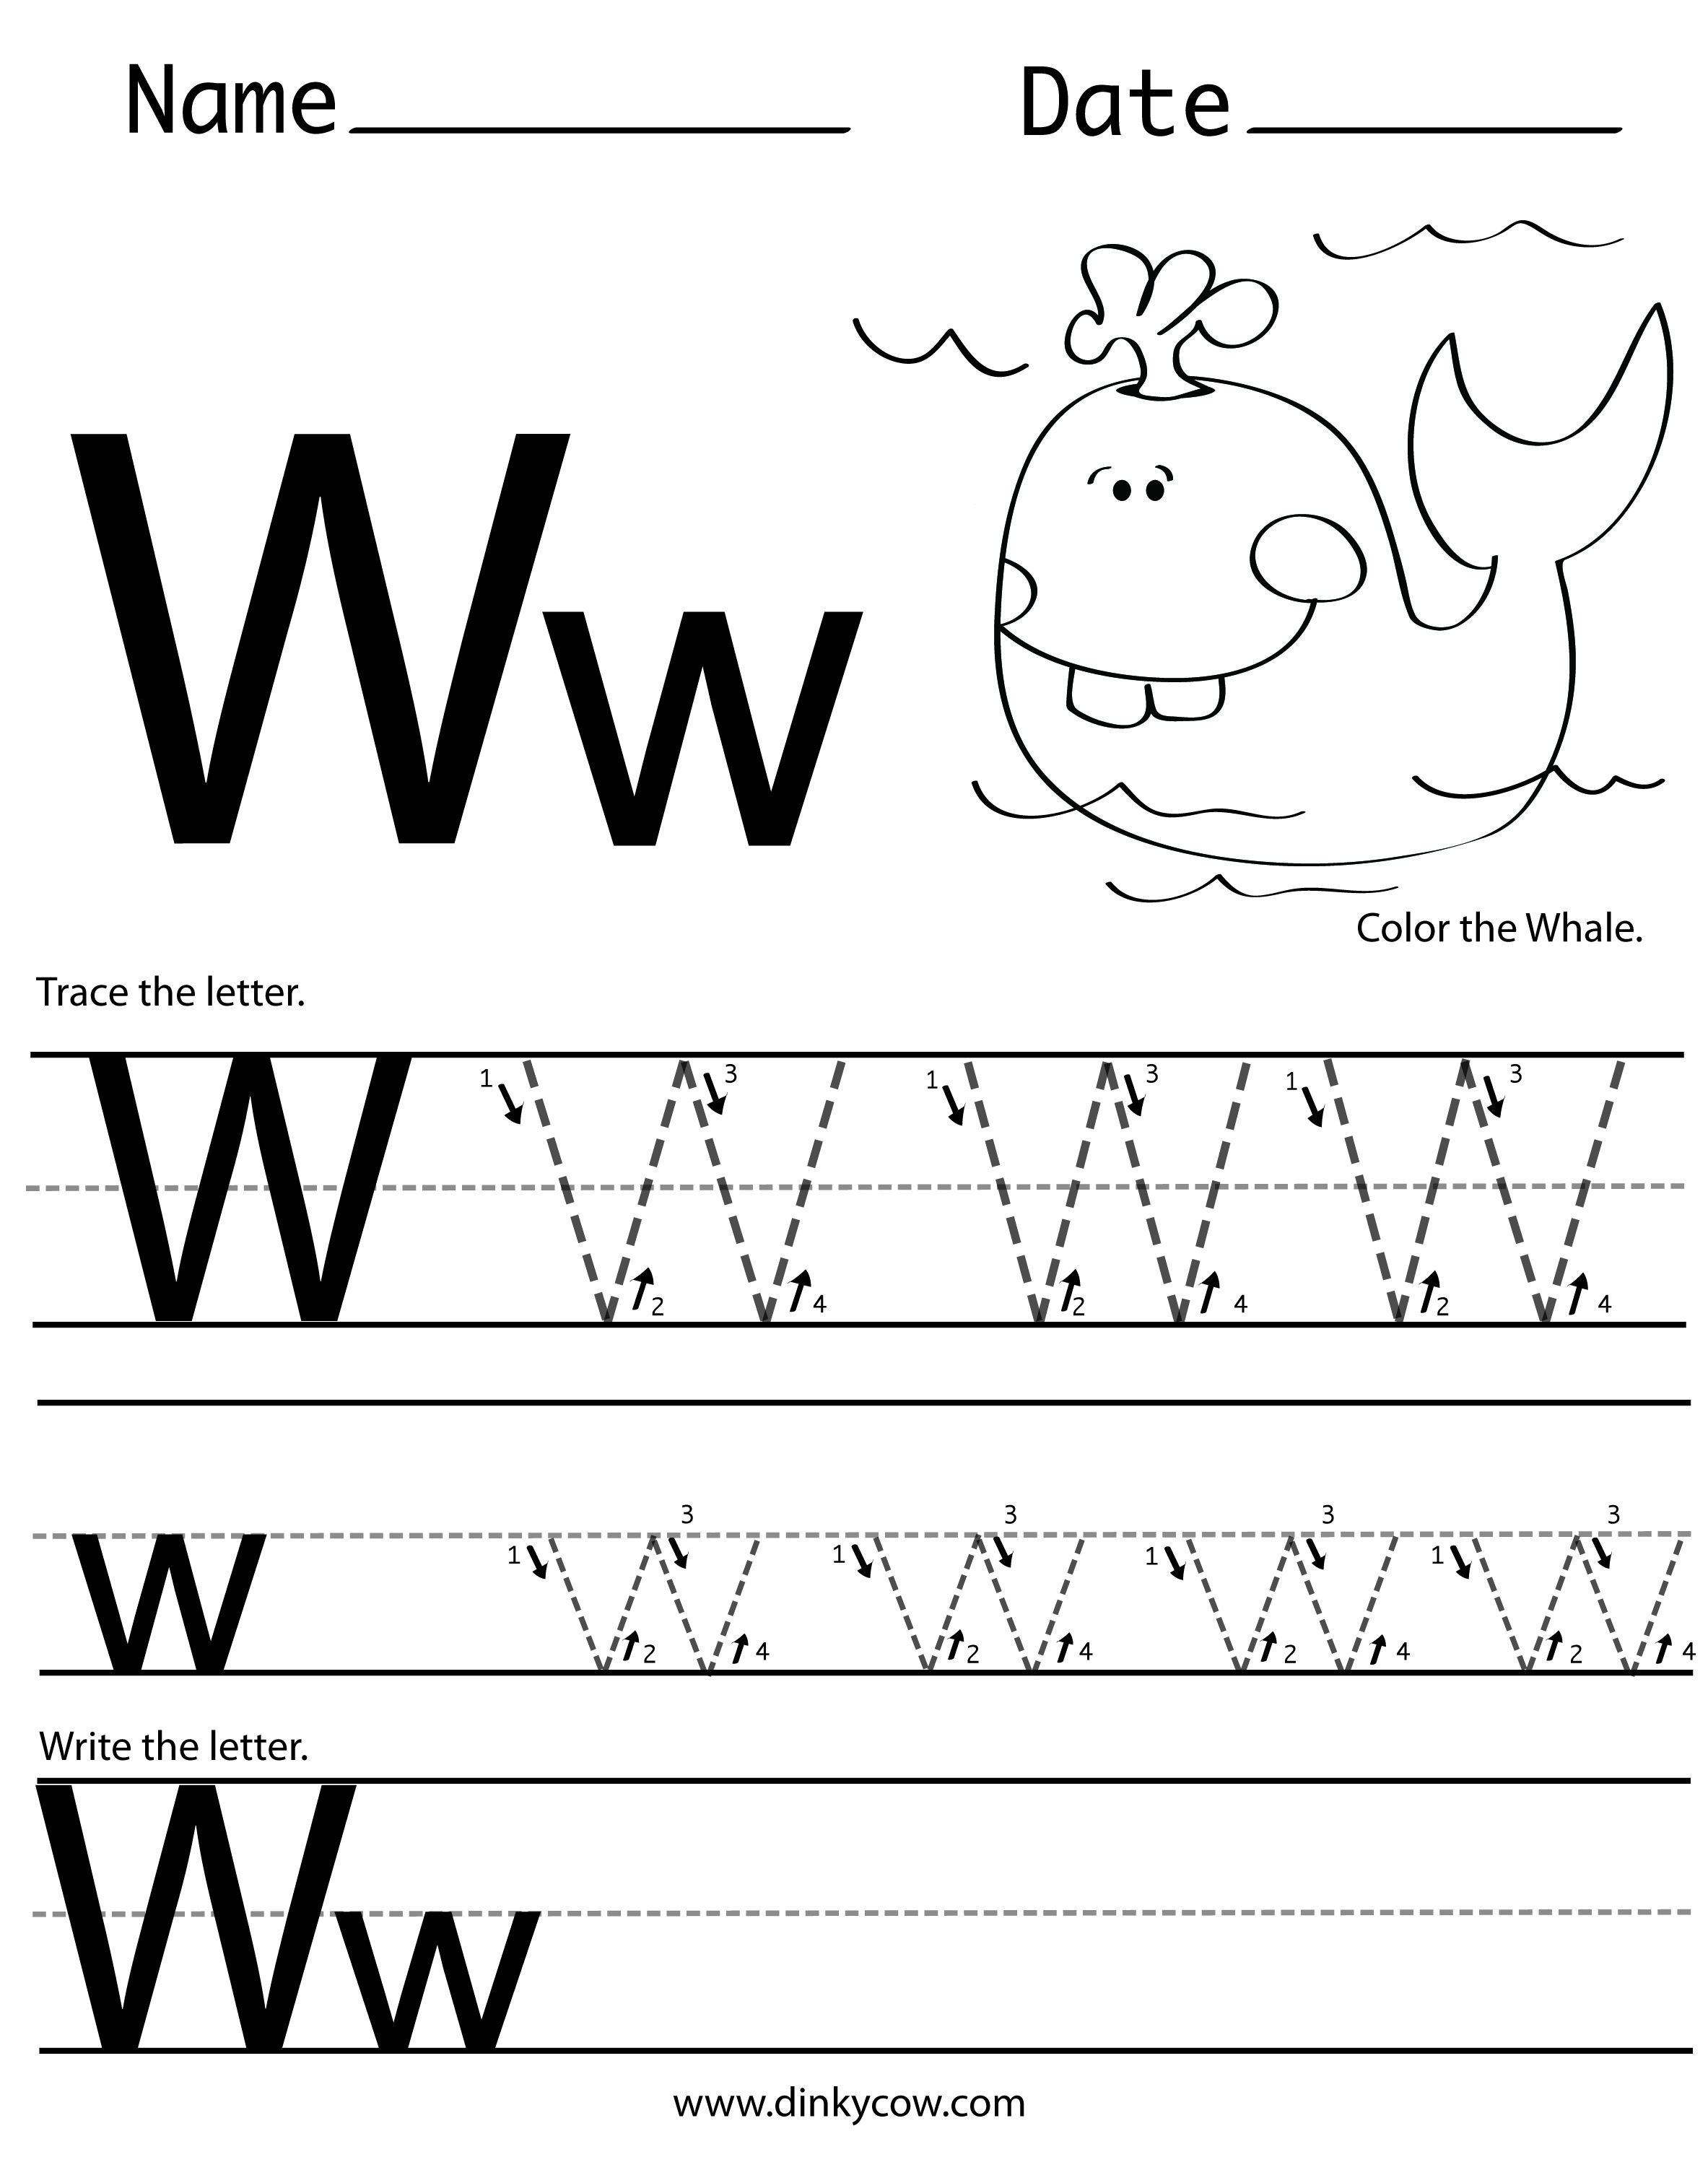 worksheet Jolly Phonics Handwriting Worksheets w free handwriting worksheet print jpg pixels dot to pixels